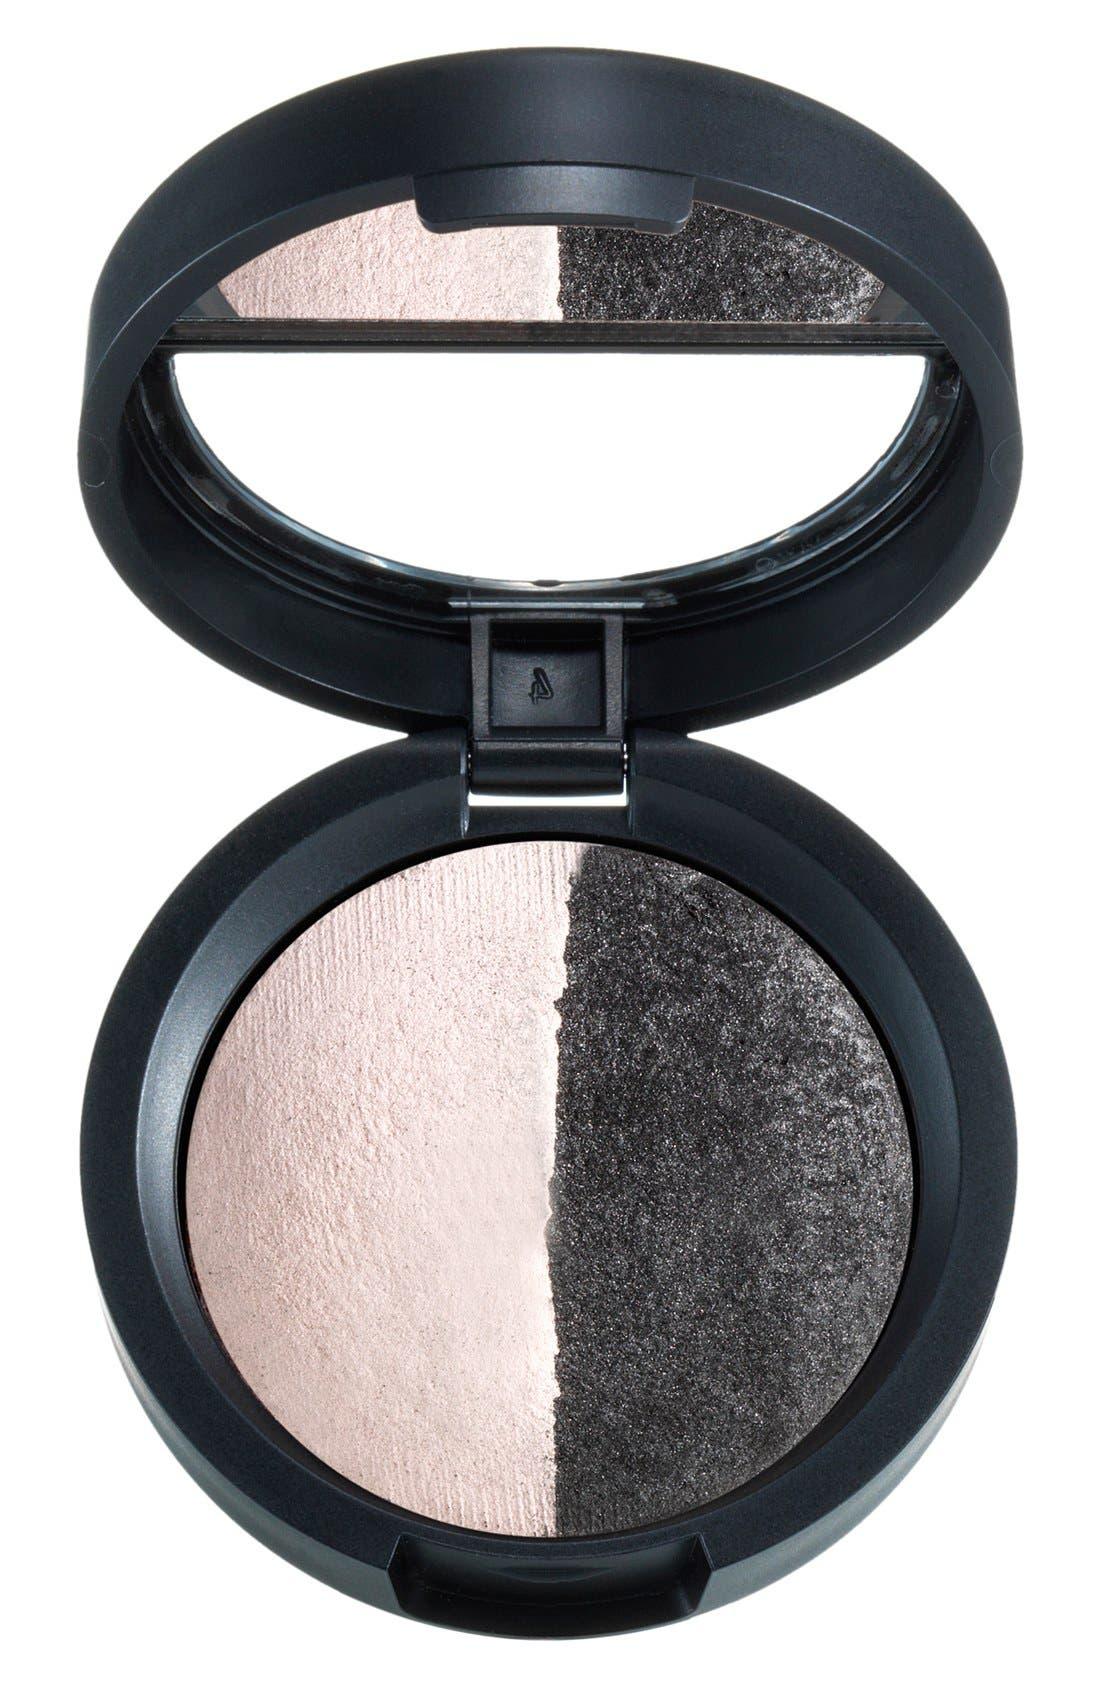 Baked Color Intense Eyeshadow Duo,                             Main thumbnail 2, color,